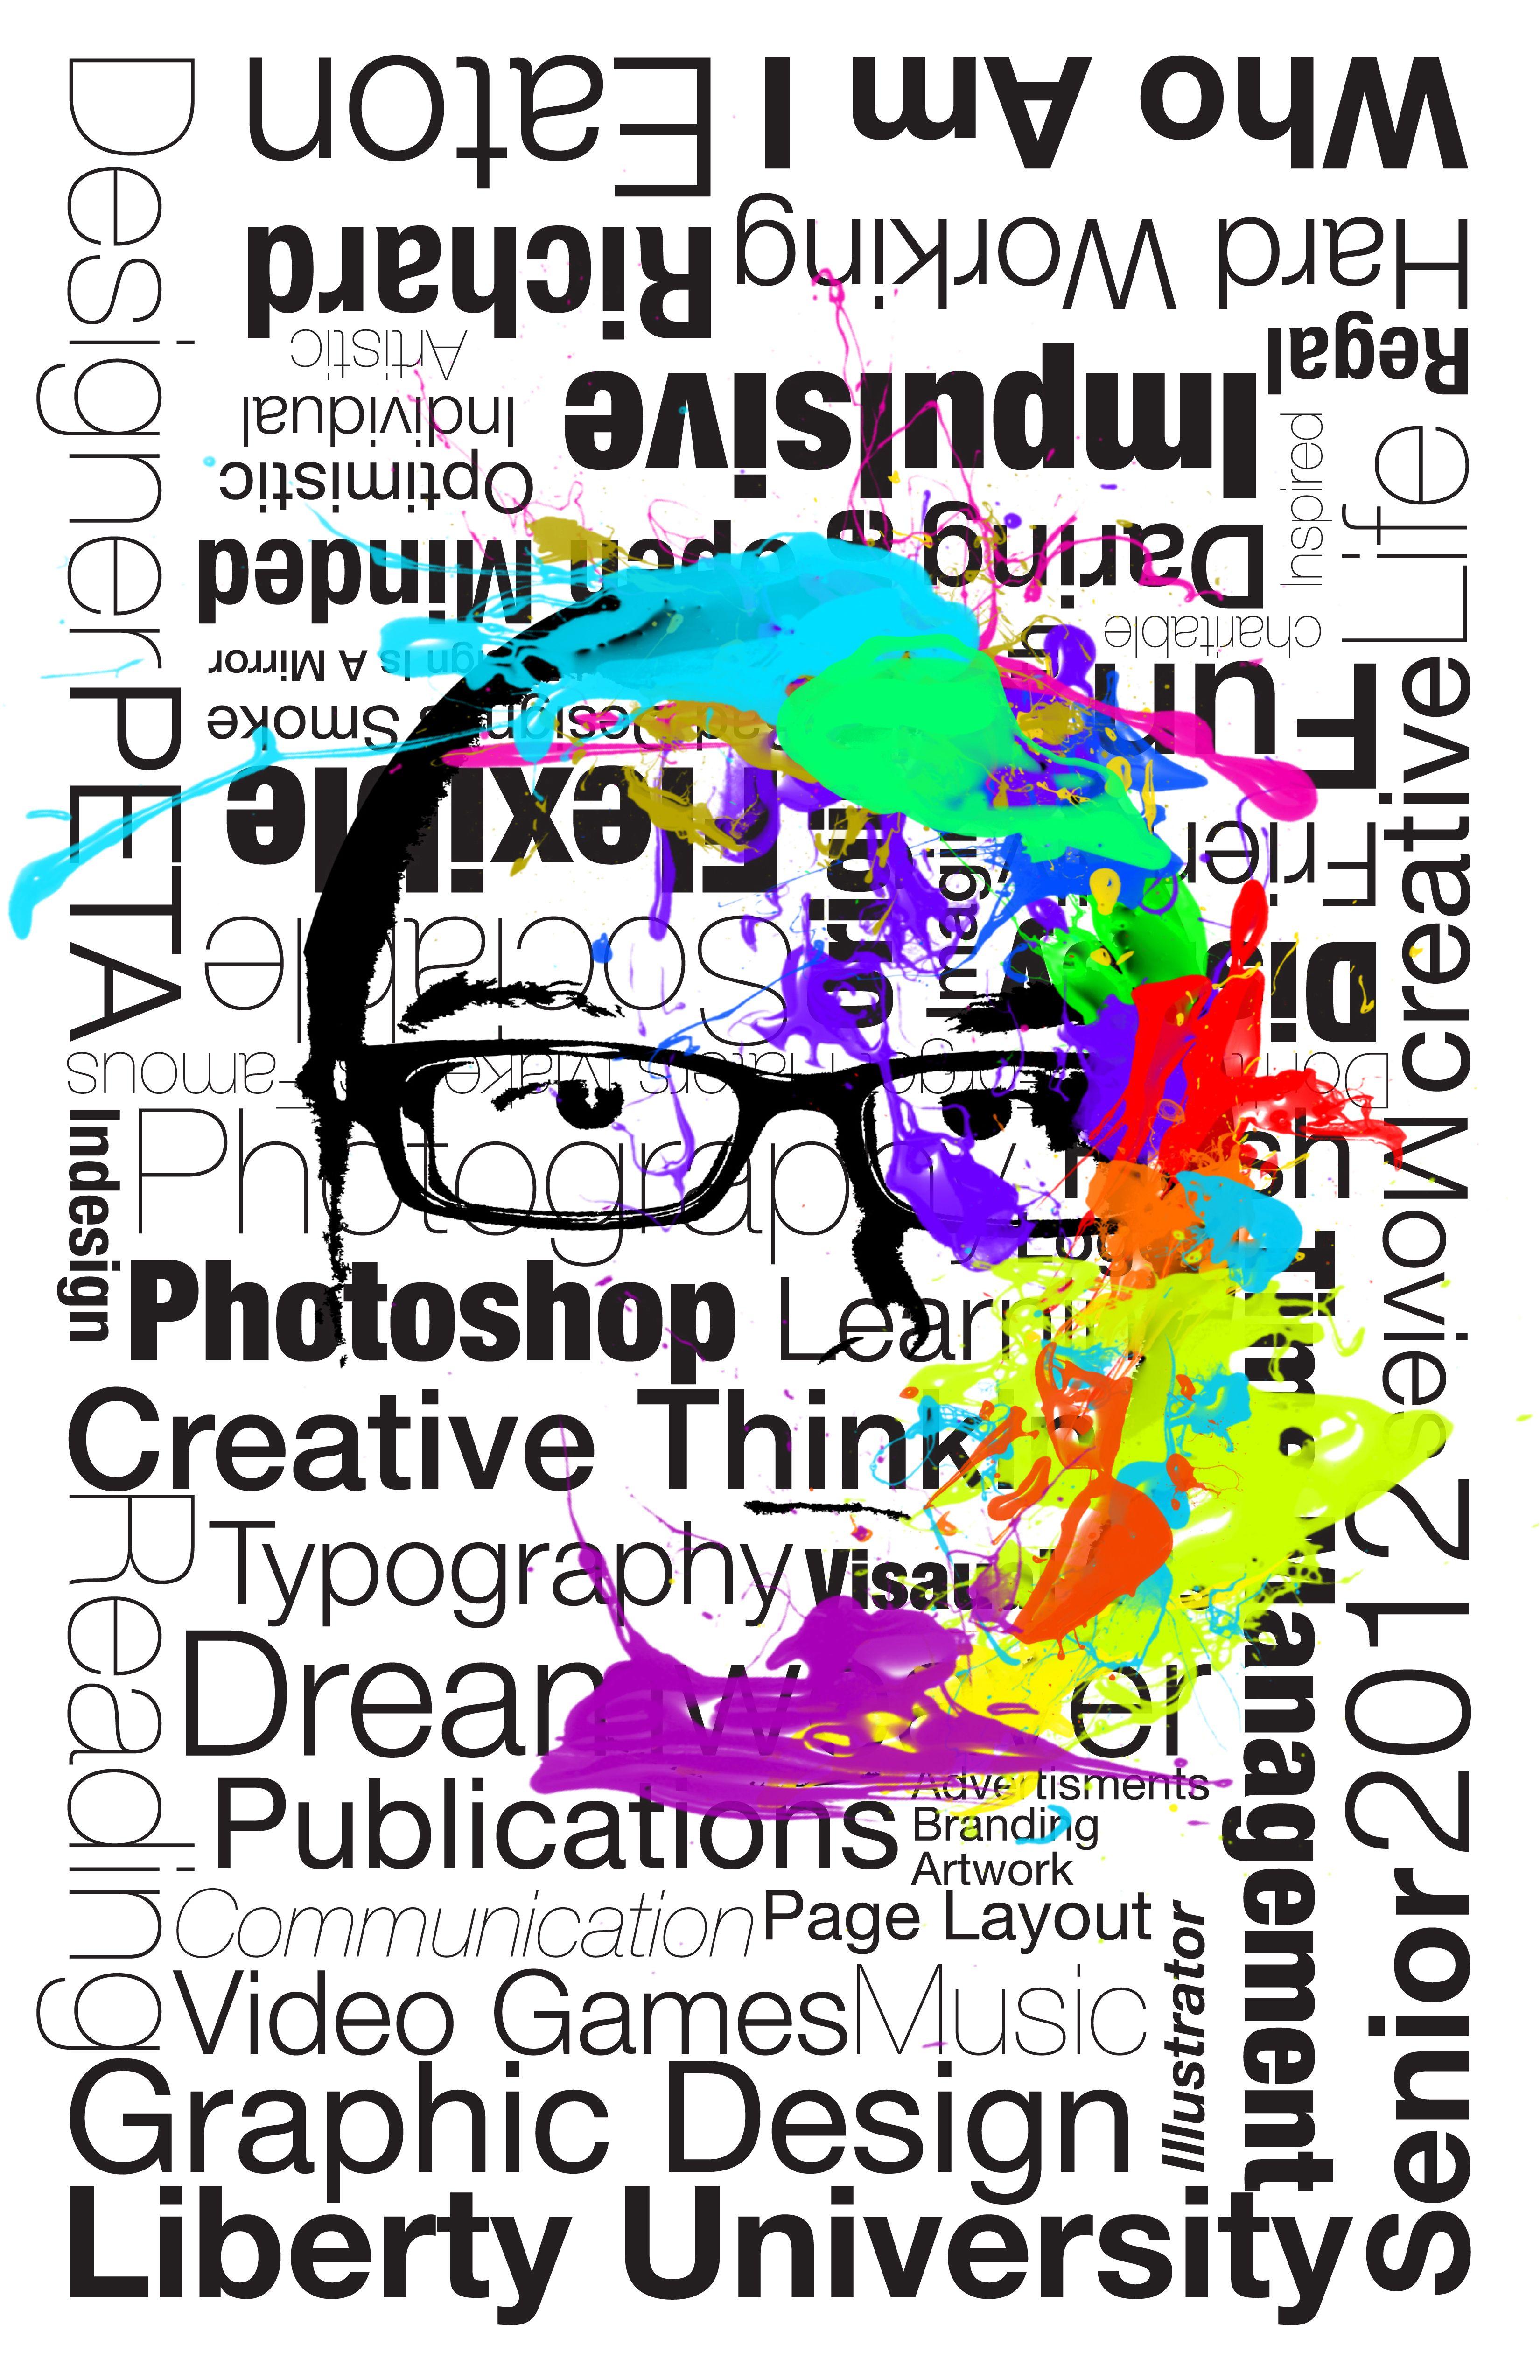 Poster design blog - A Self Promotion Poster Self Promotiondesign Blogs